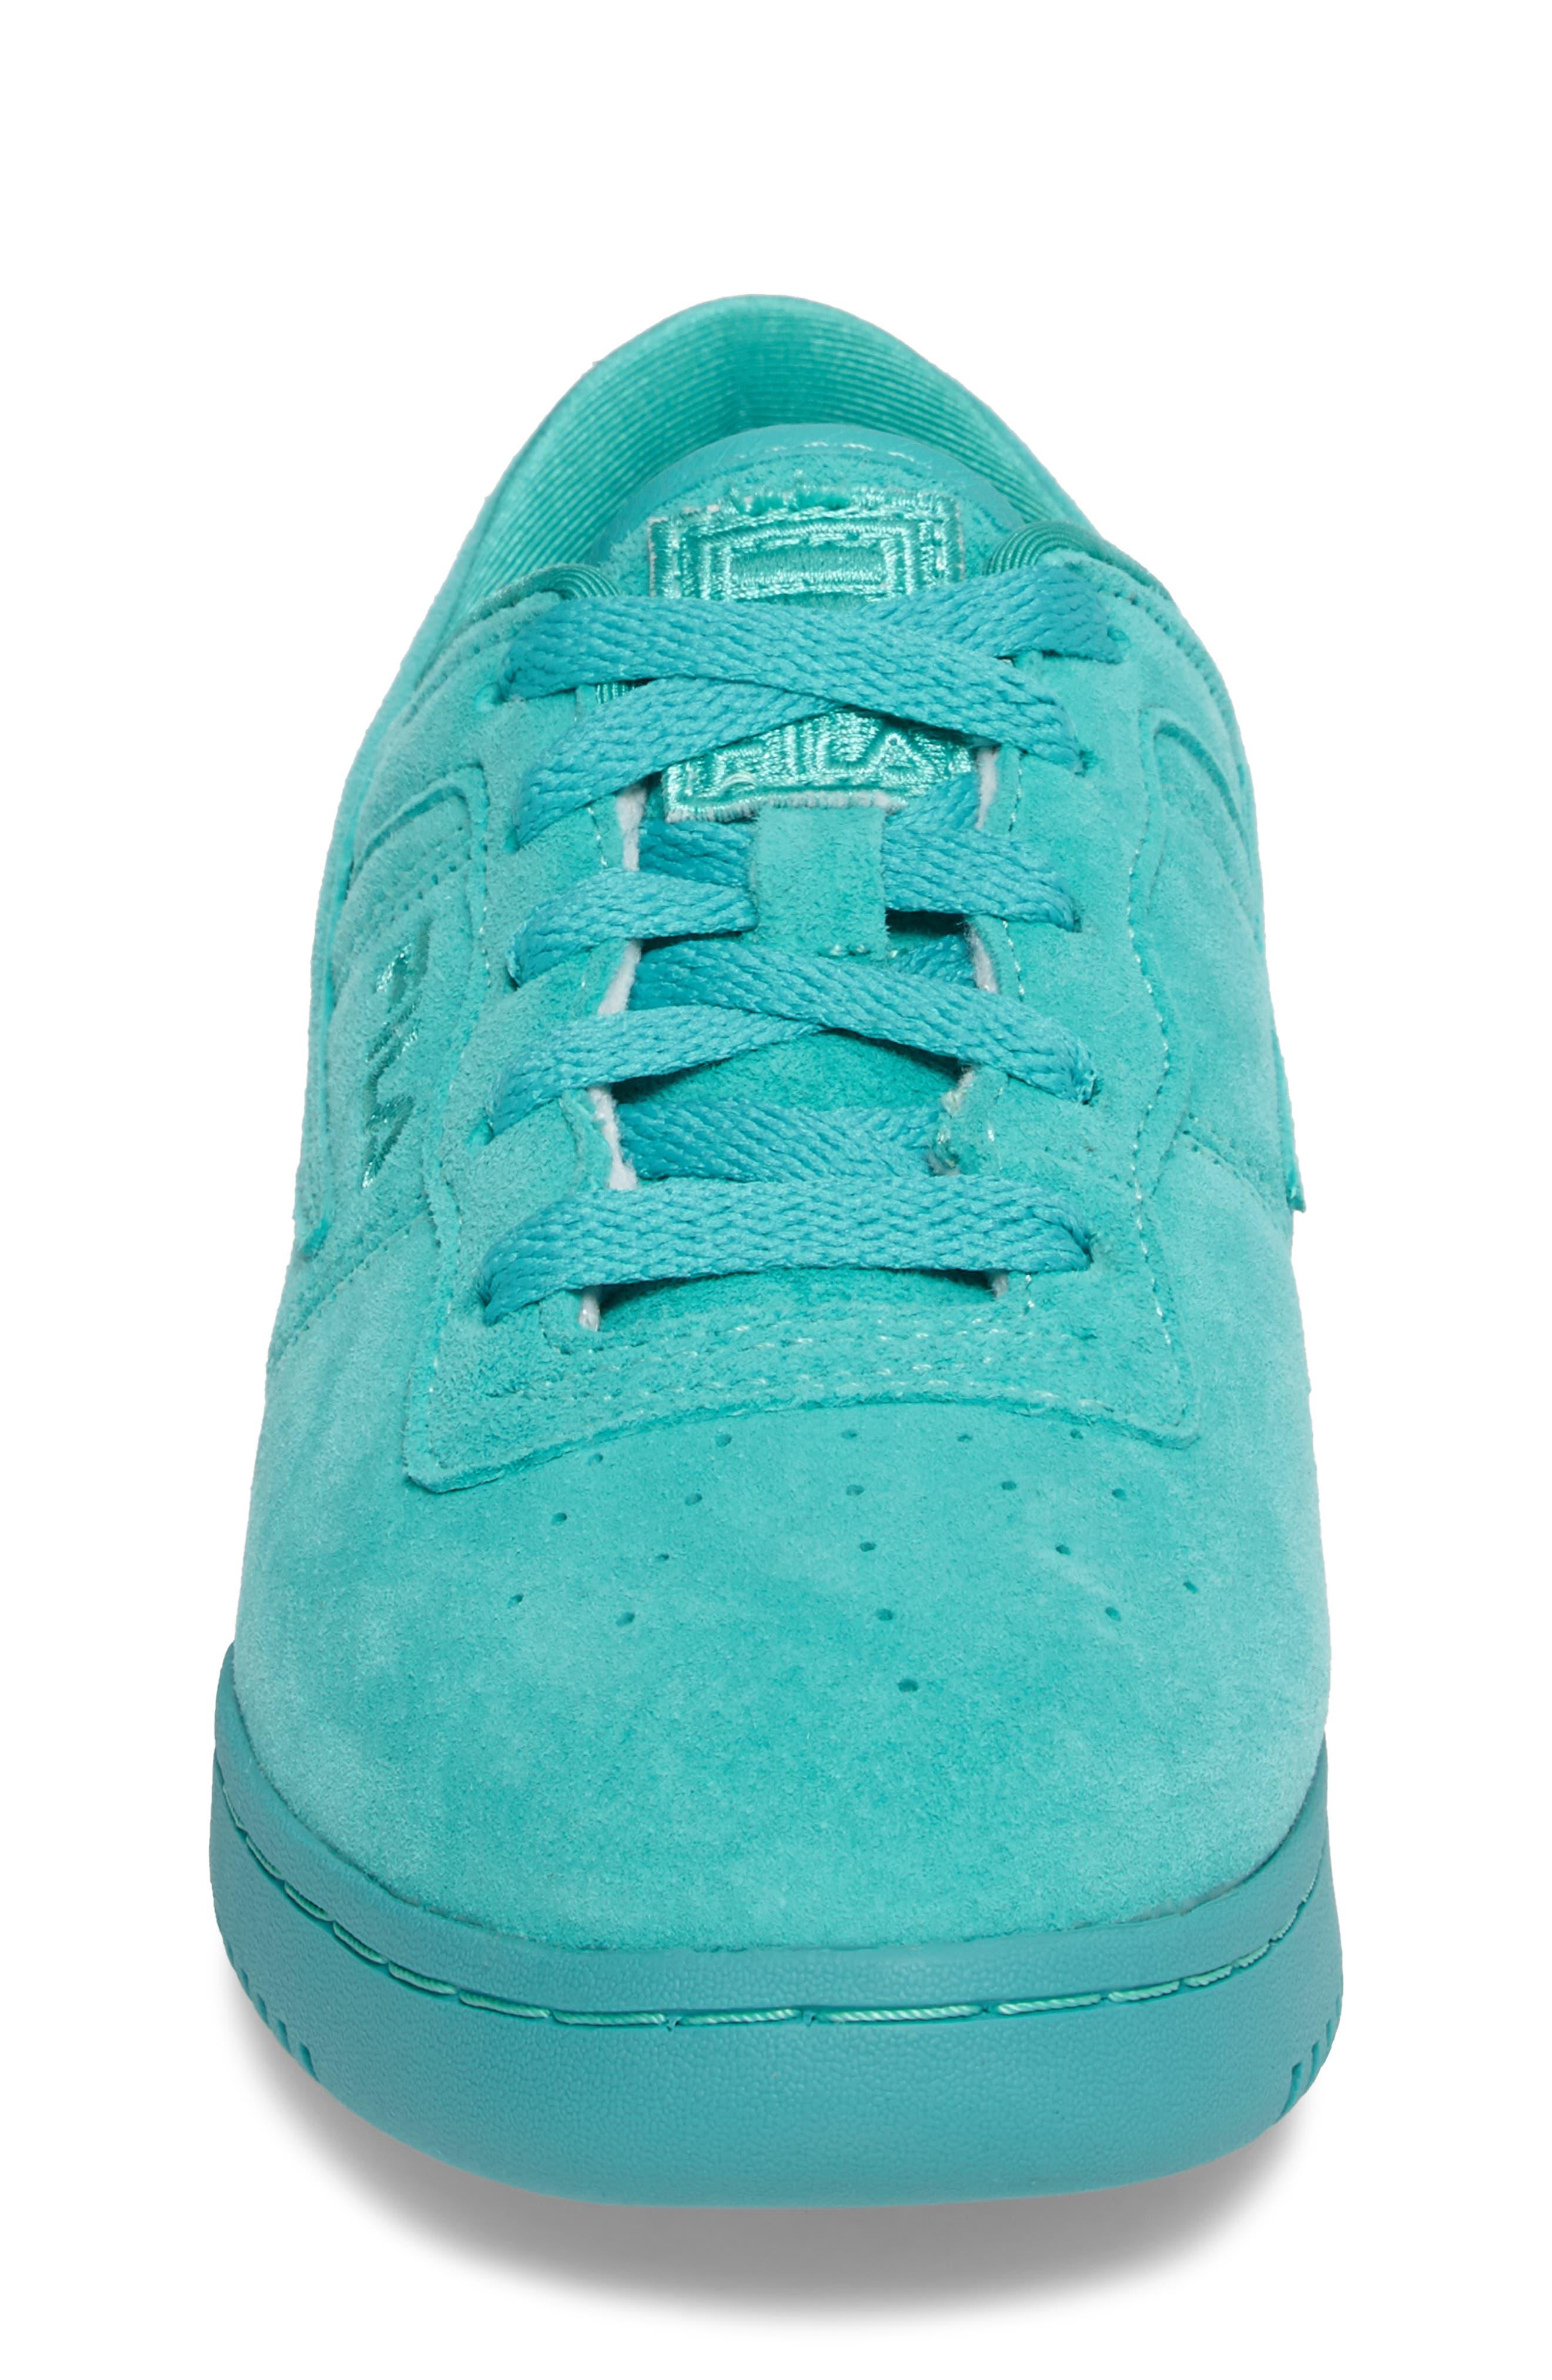 Original Fitness Sneaker,                             Alternate thumbnail 4, color,                             400